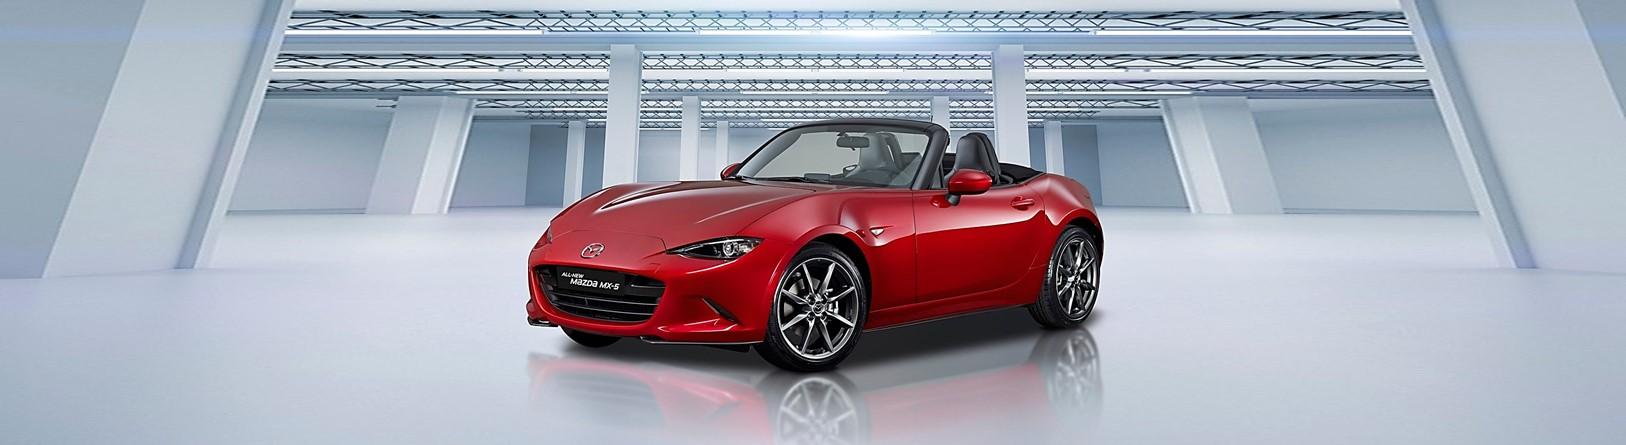 All new Mazda MX-5